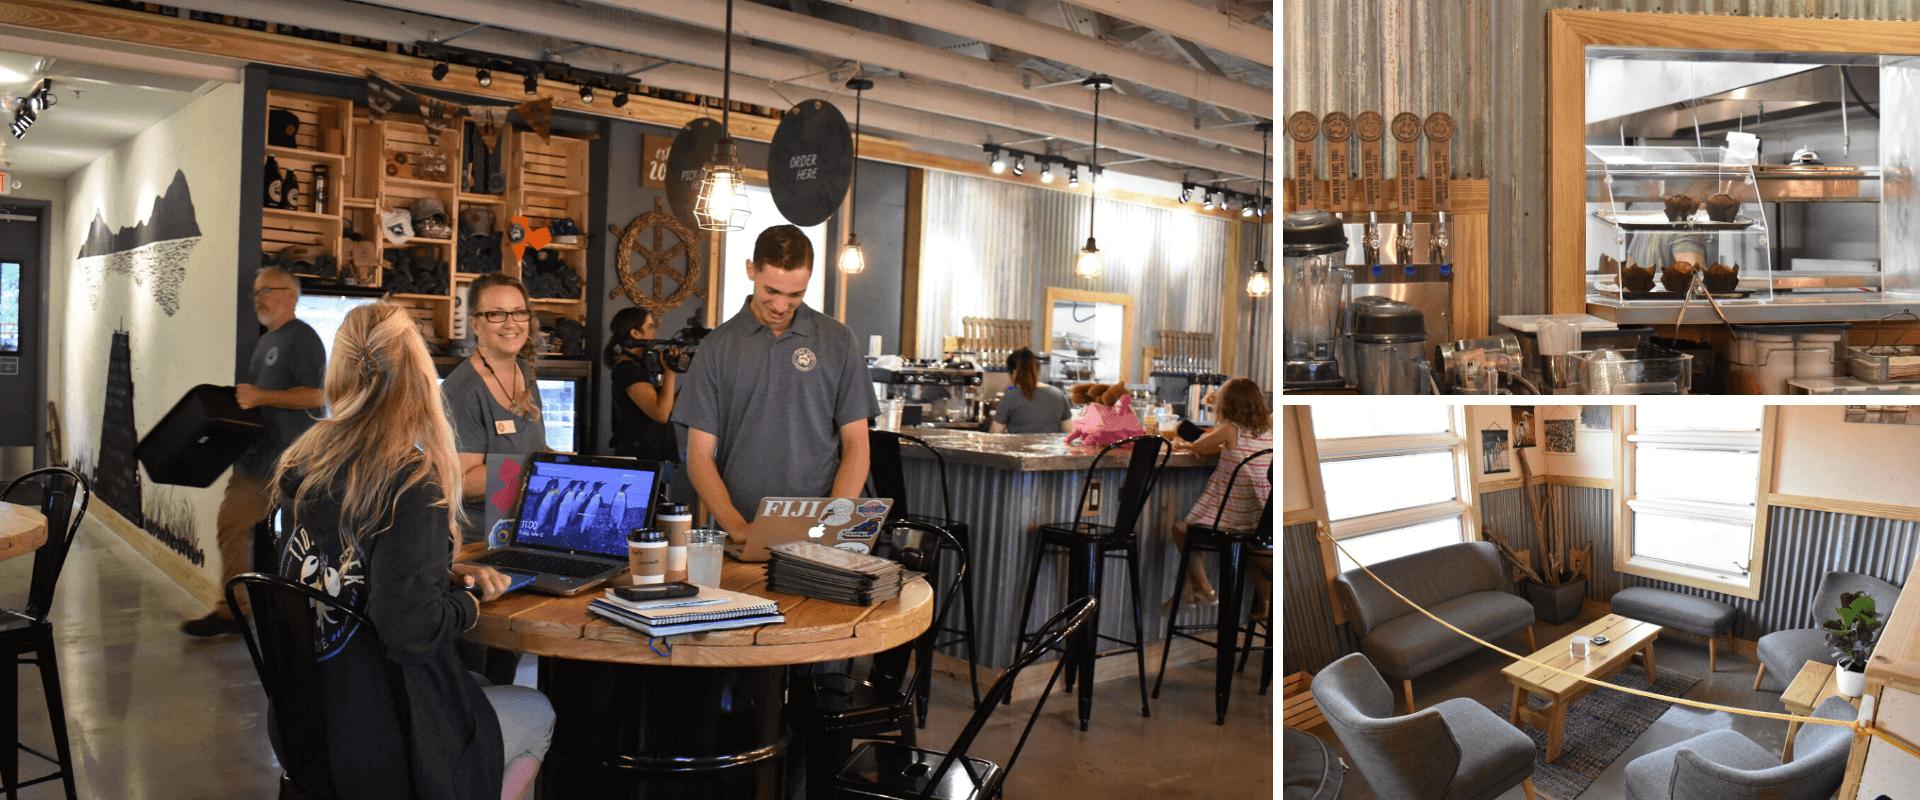 Tidal Creek Brewhouse indoor dining